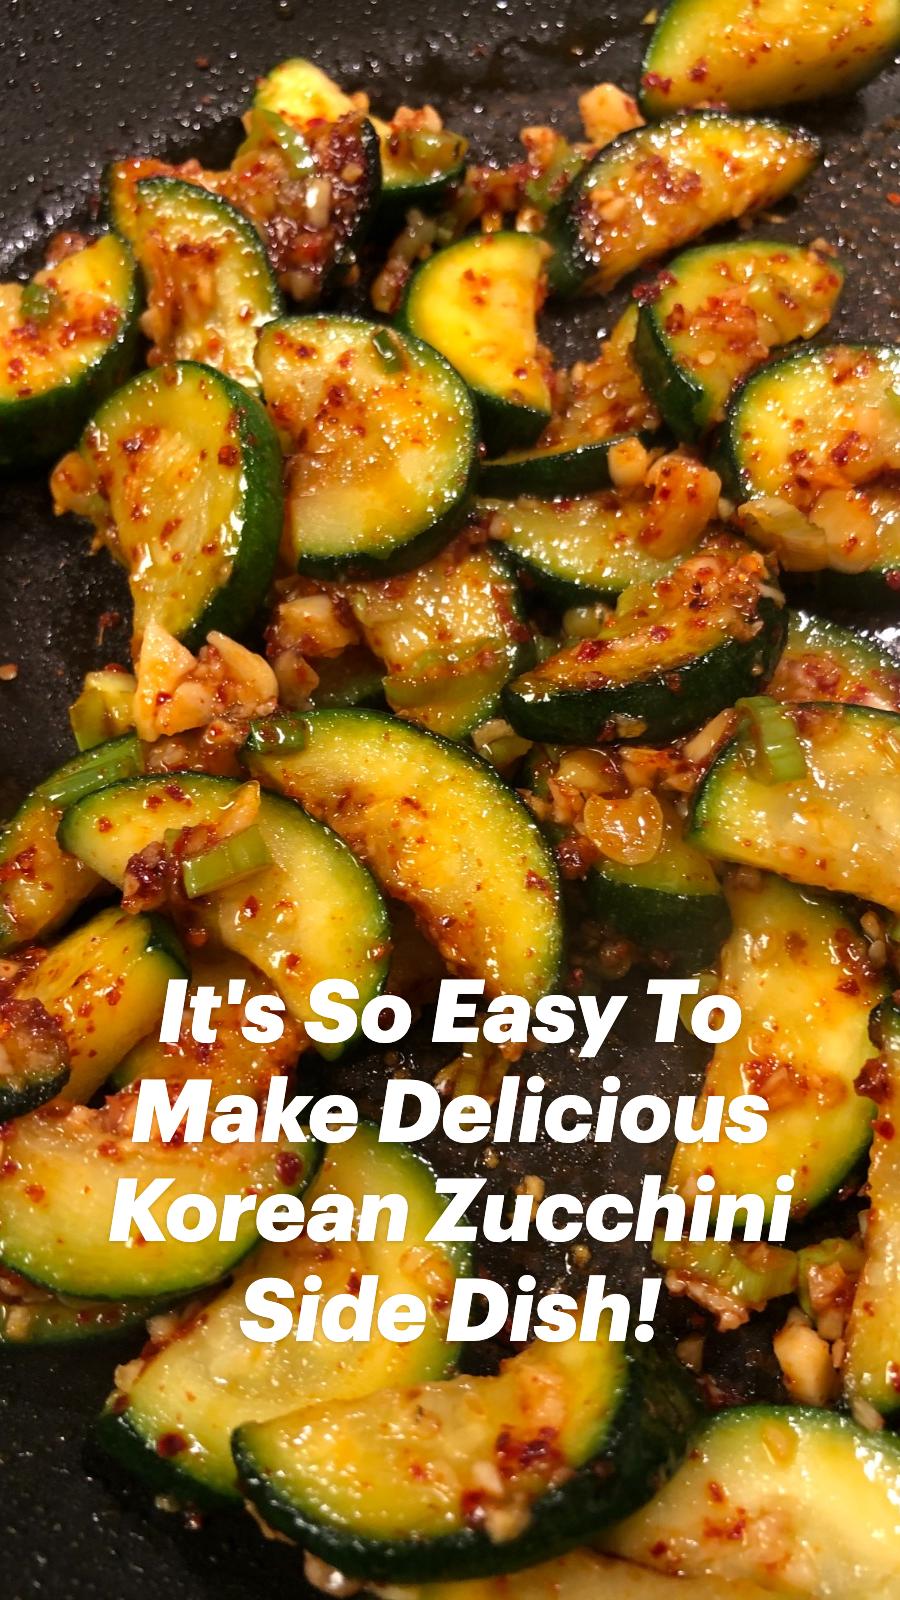 It's So Easy To Make Delicious Korean Zucchini Side Dish!